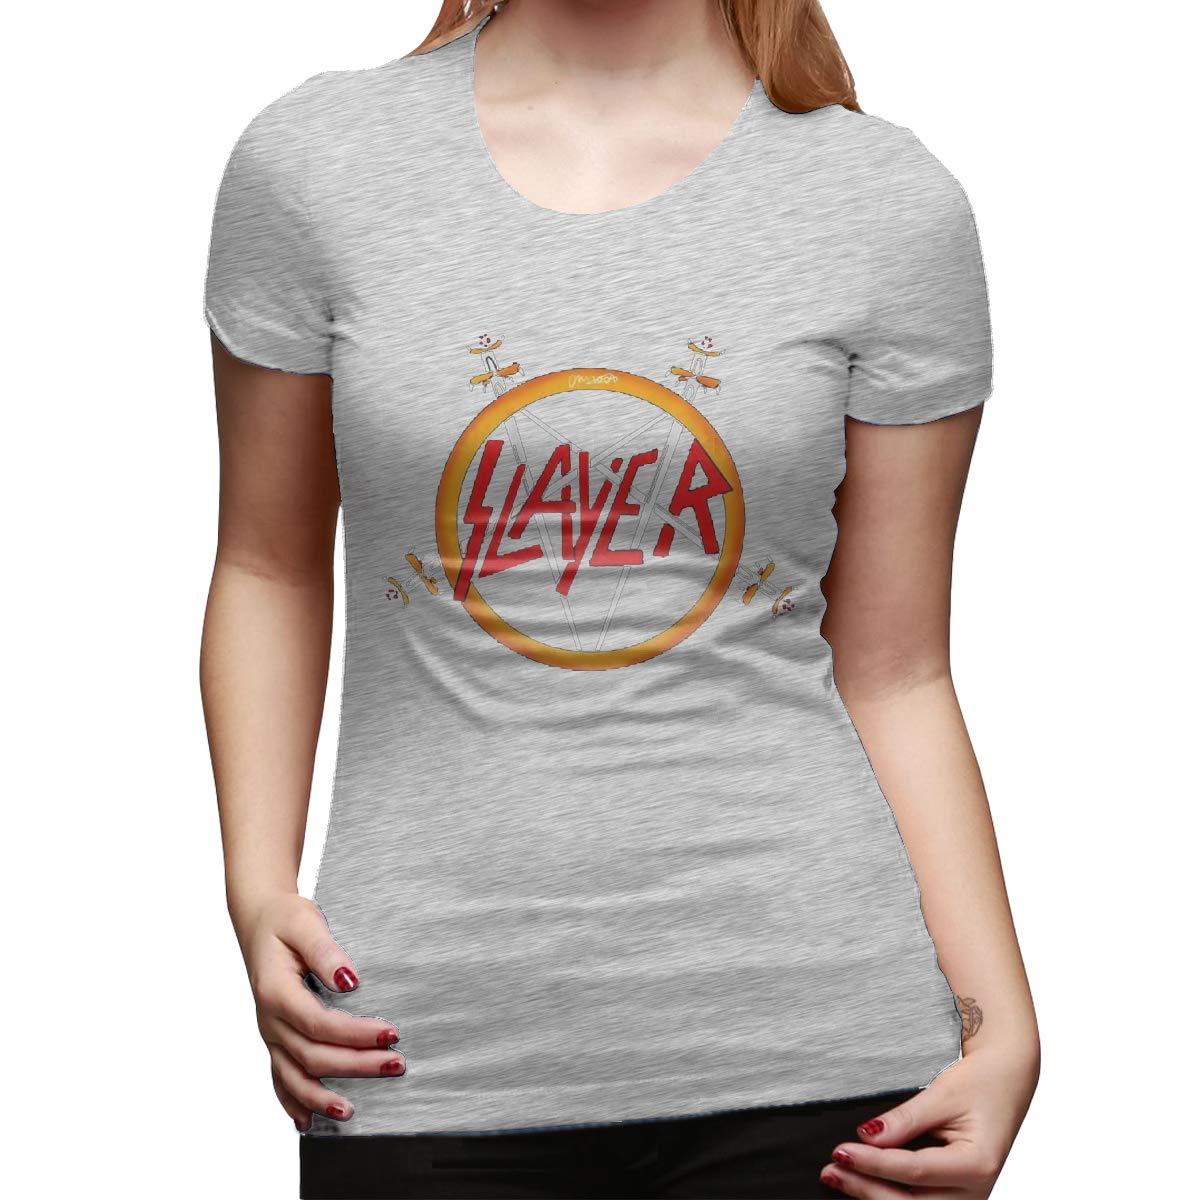 Short Sleeve T Shirt Hipster Retro Maneg Slayer Rock Band Logo Gray 8596